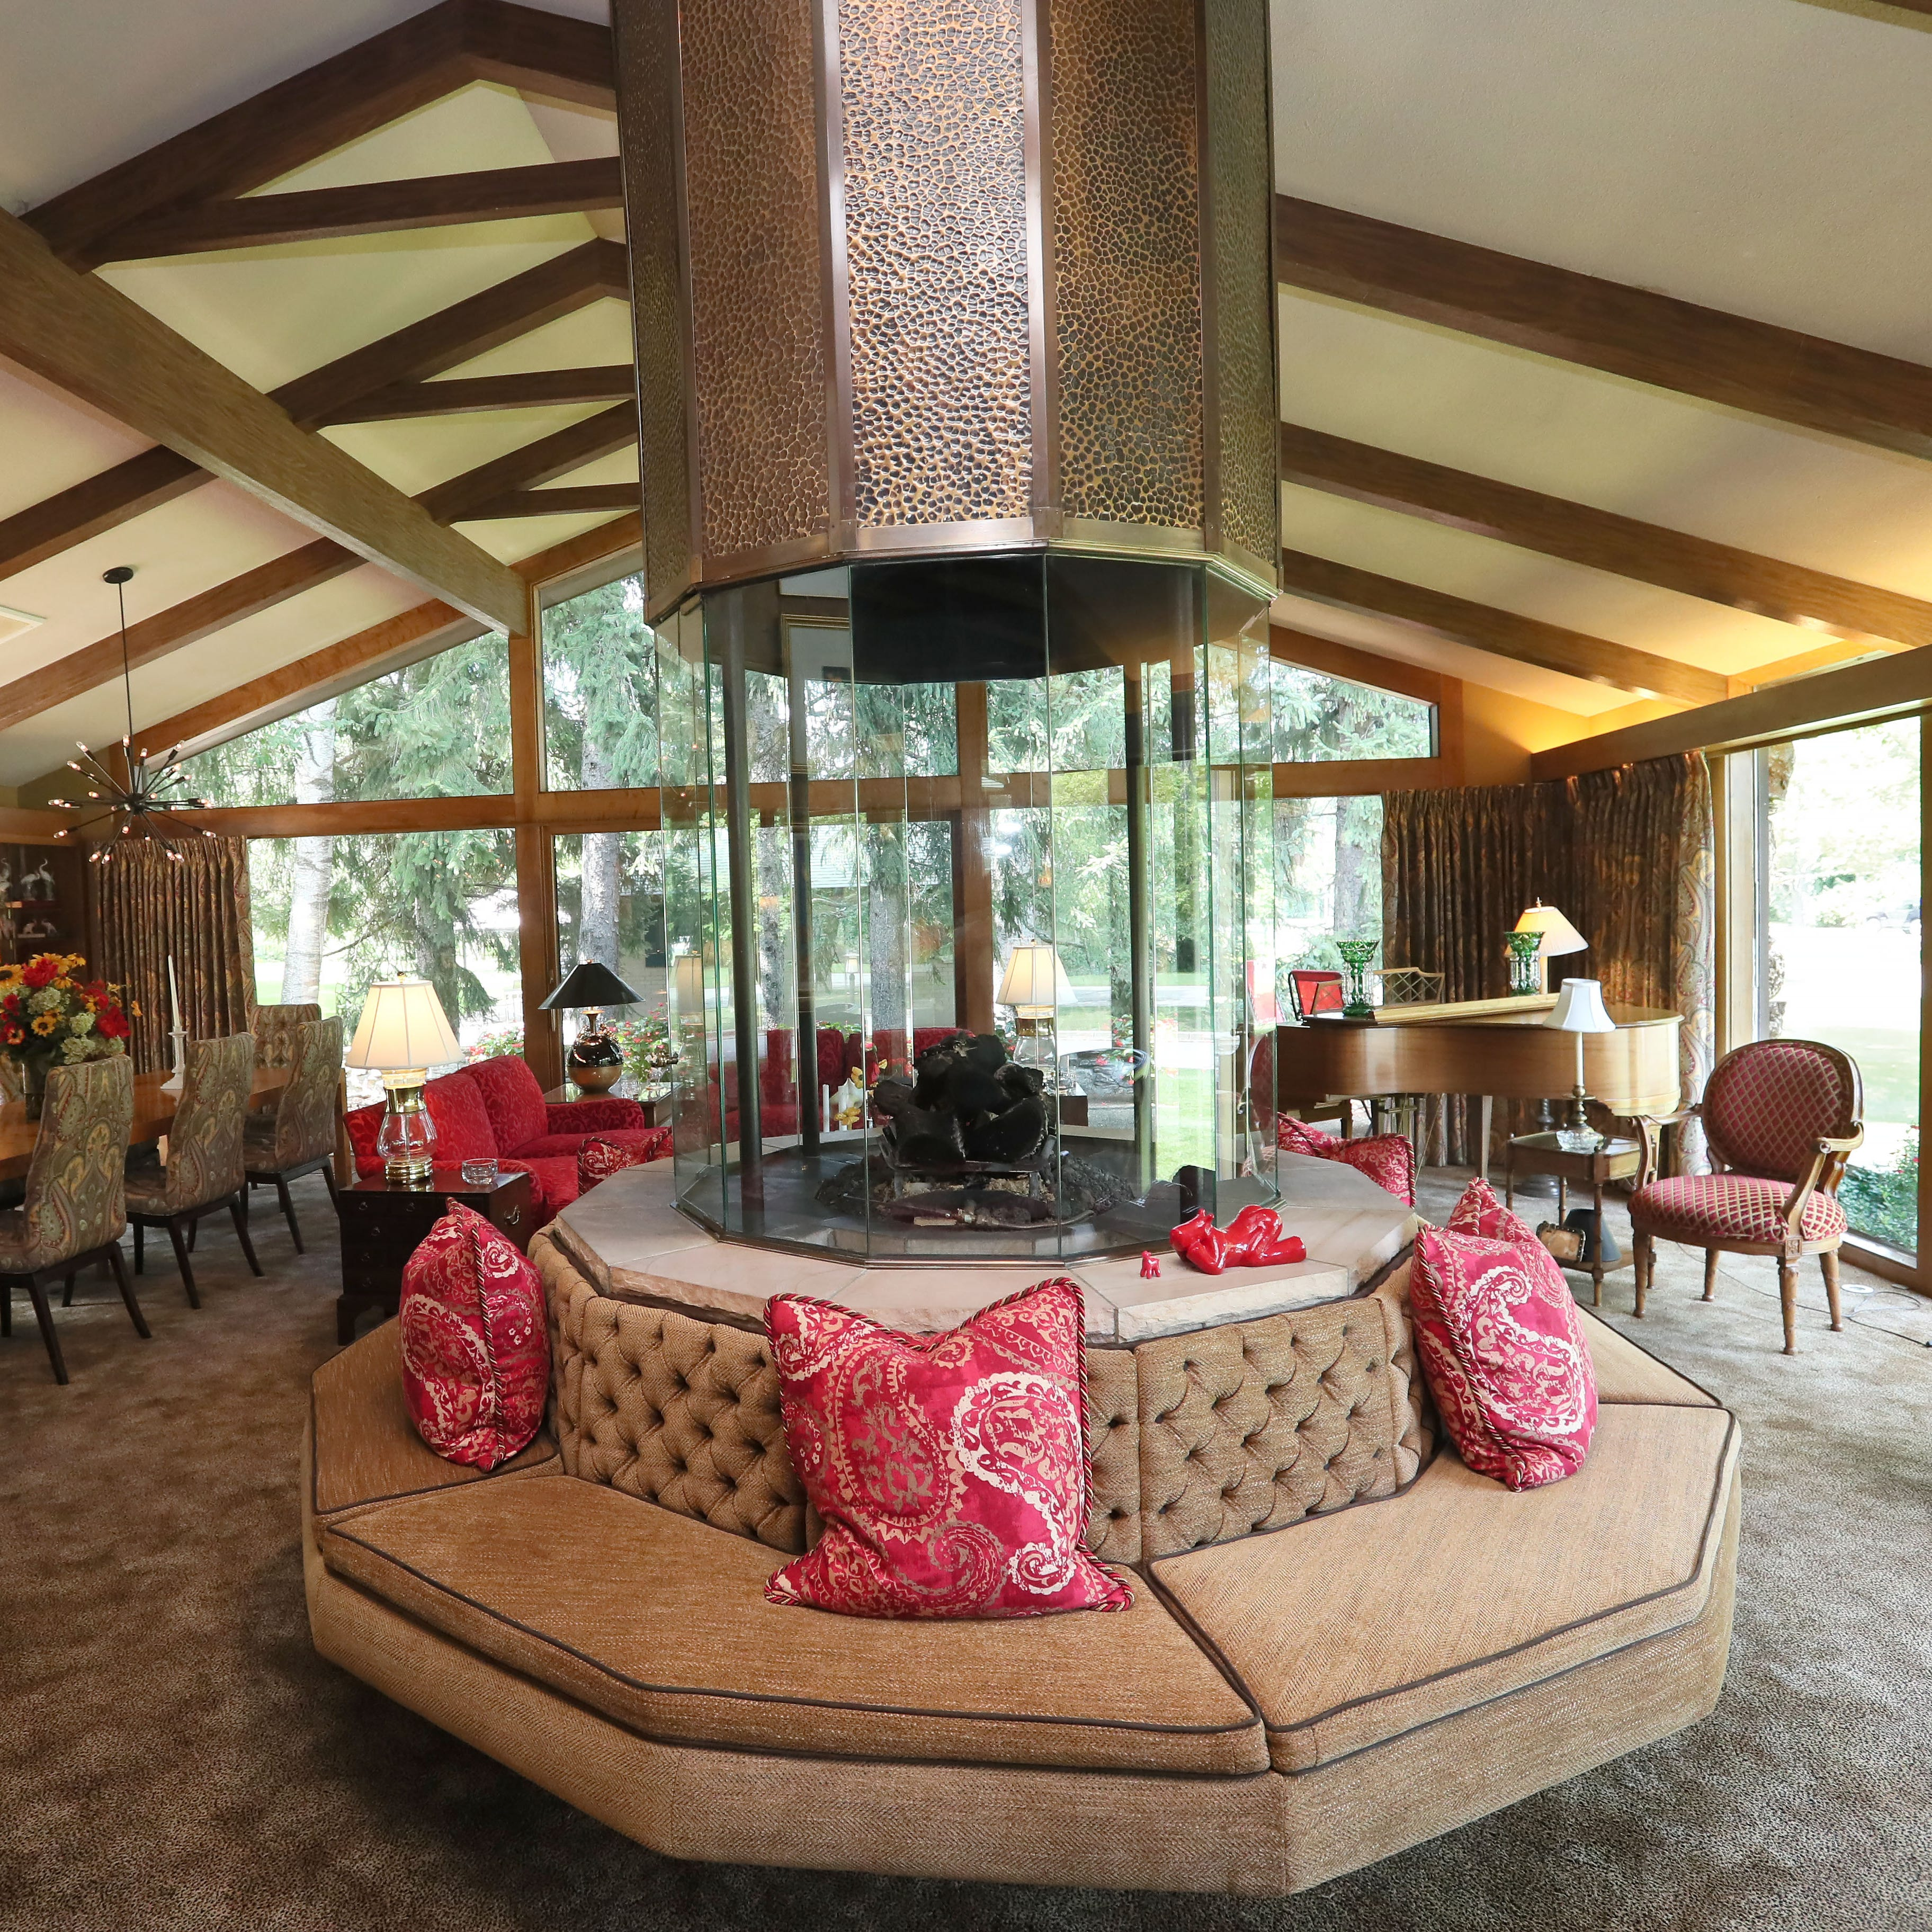 Antique-filled midcentury modern home in West Allis stands apart